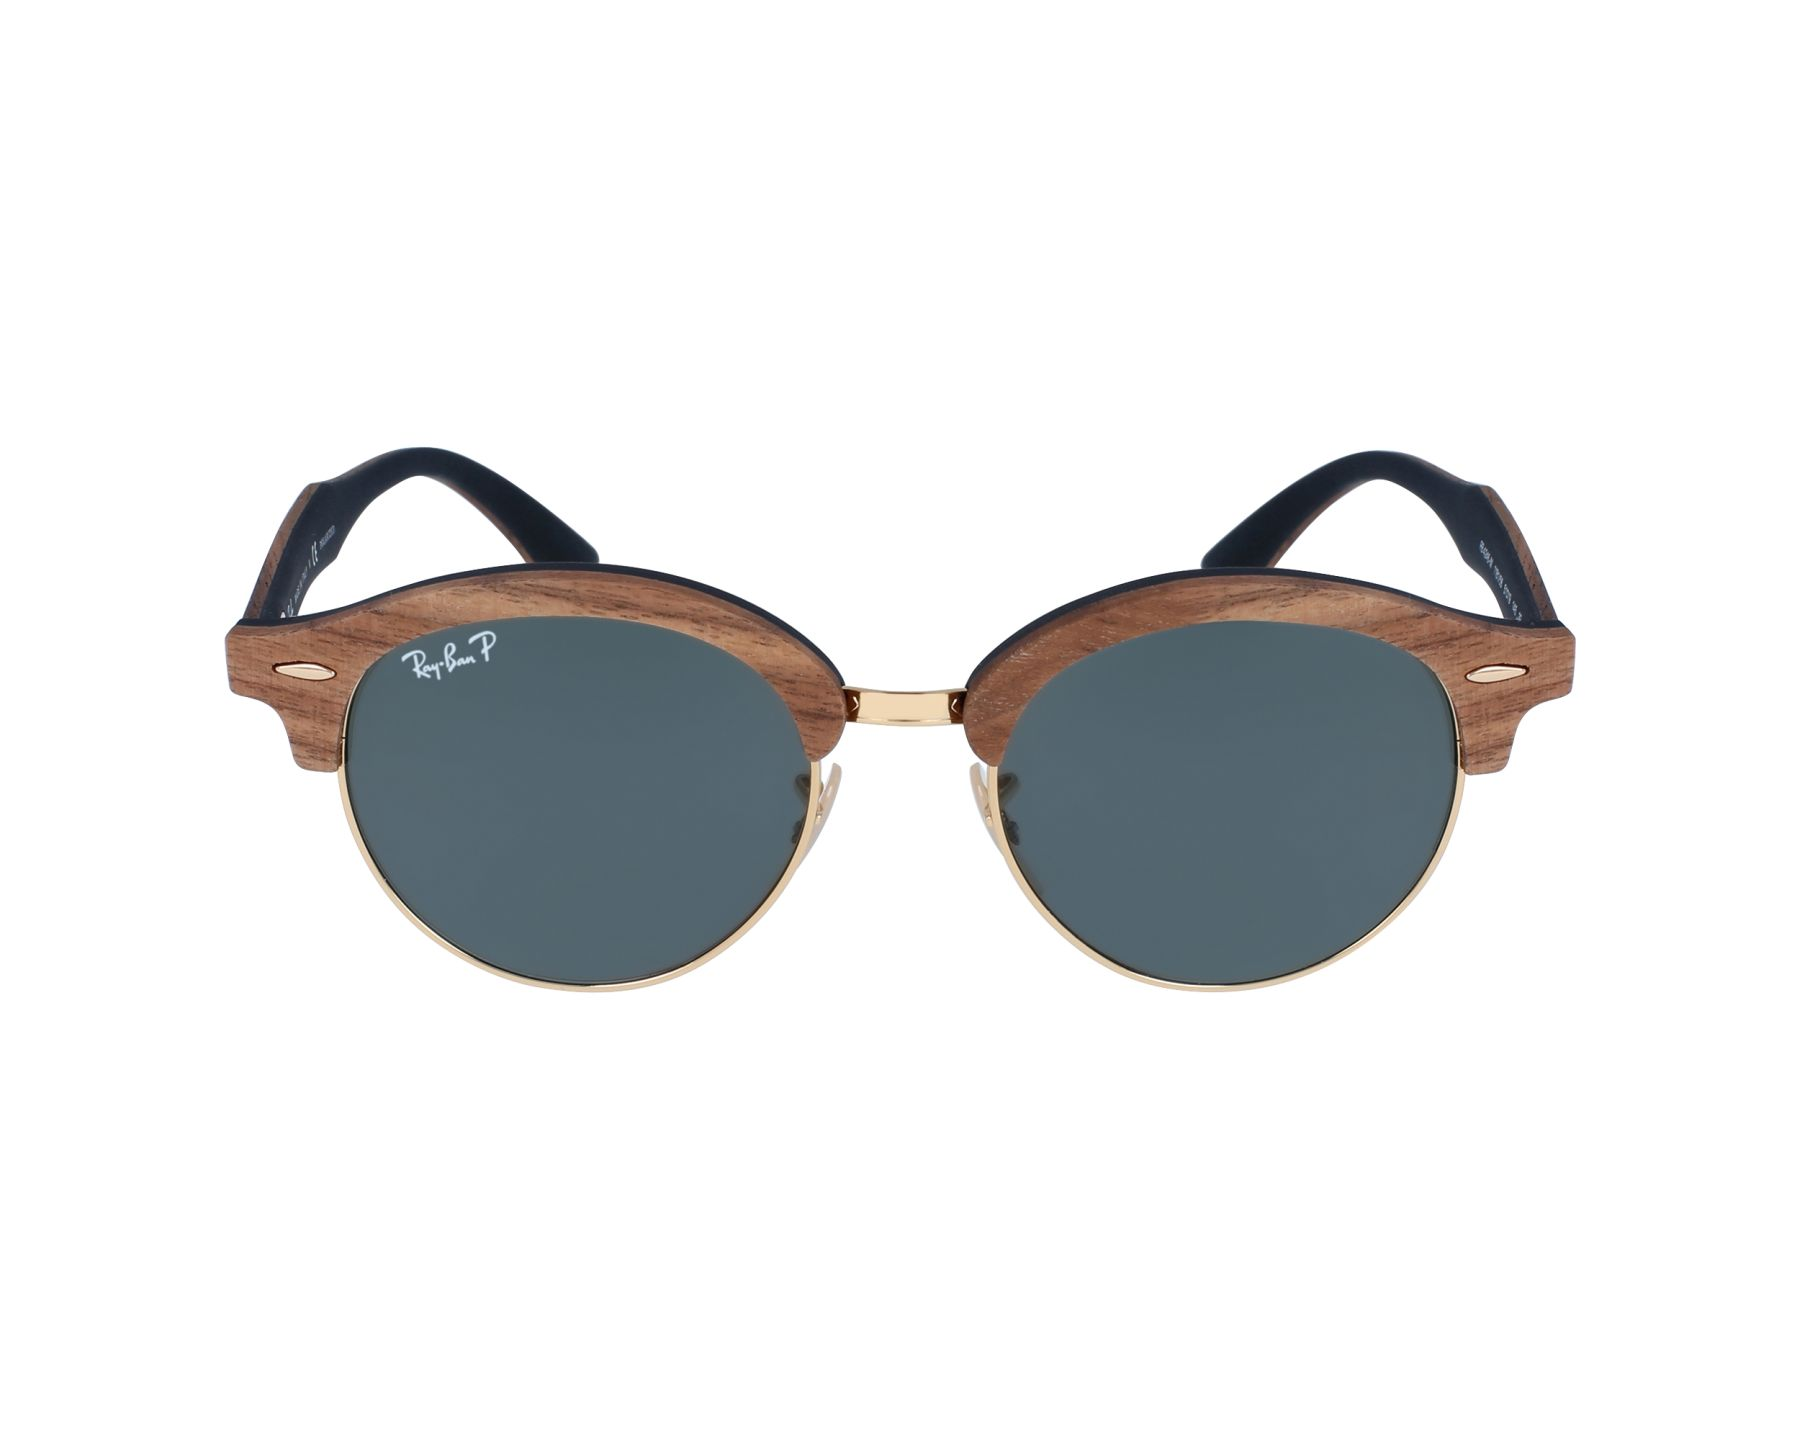 38737ad6f2 Polarized. Sunglasses Ray-Ban RB-4246-M 1181 58 51-19 Wood